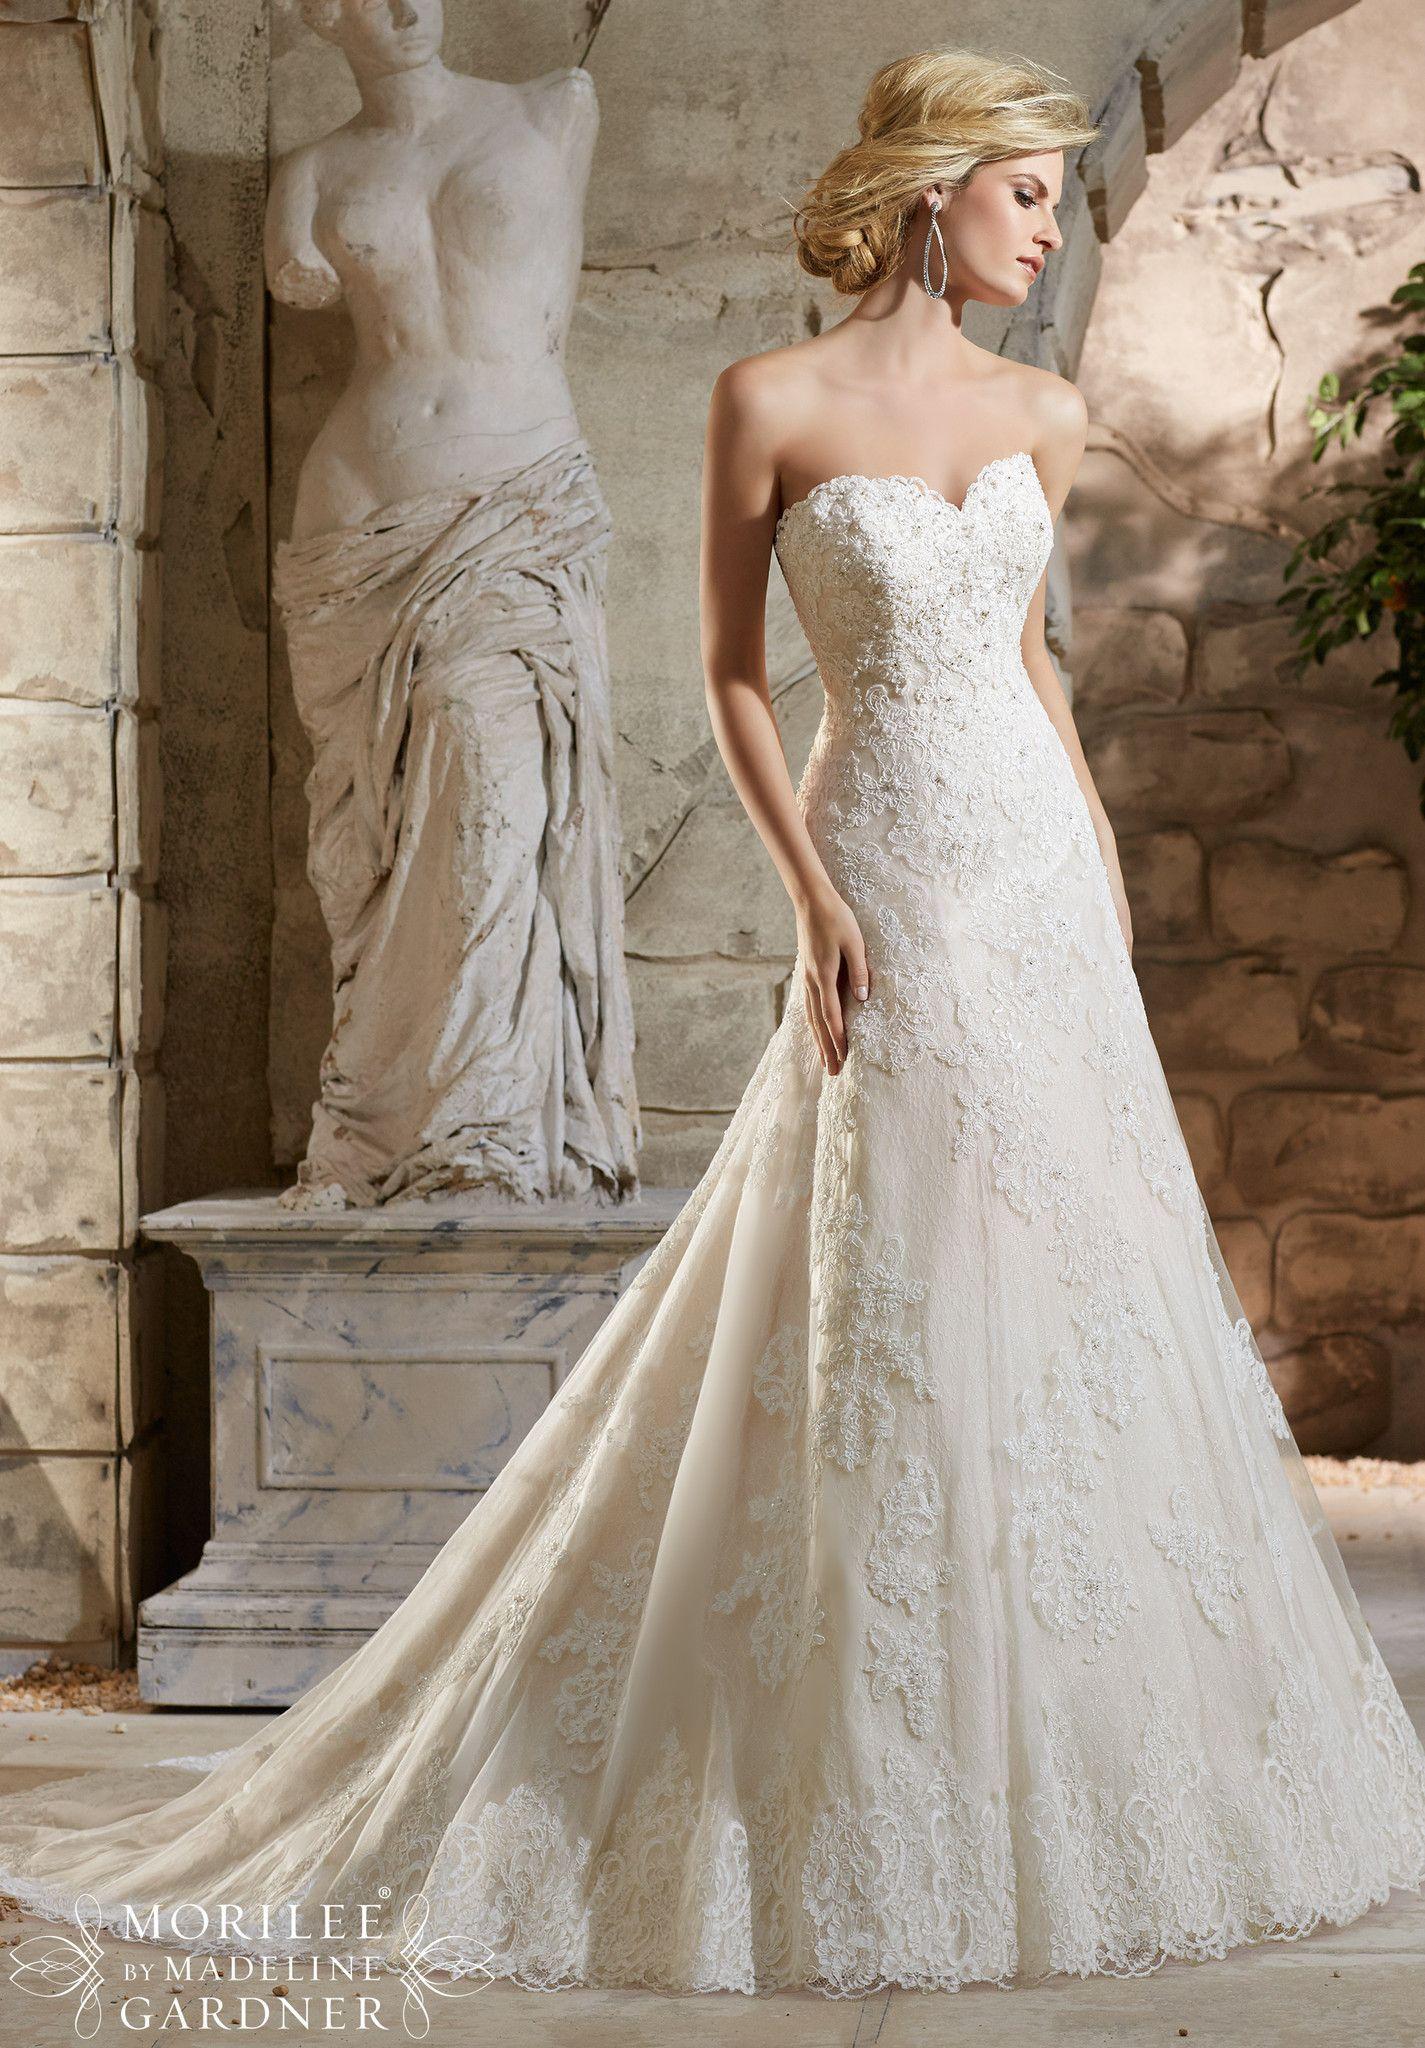 Mori lee all dressed up bridal gown mori lee wedding